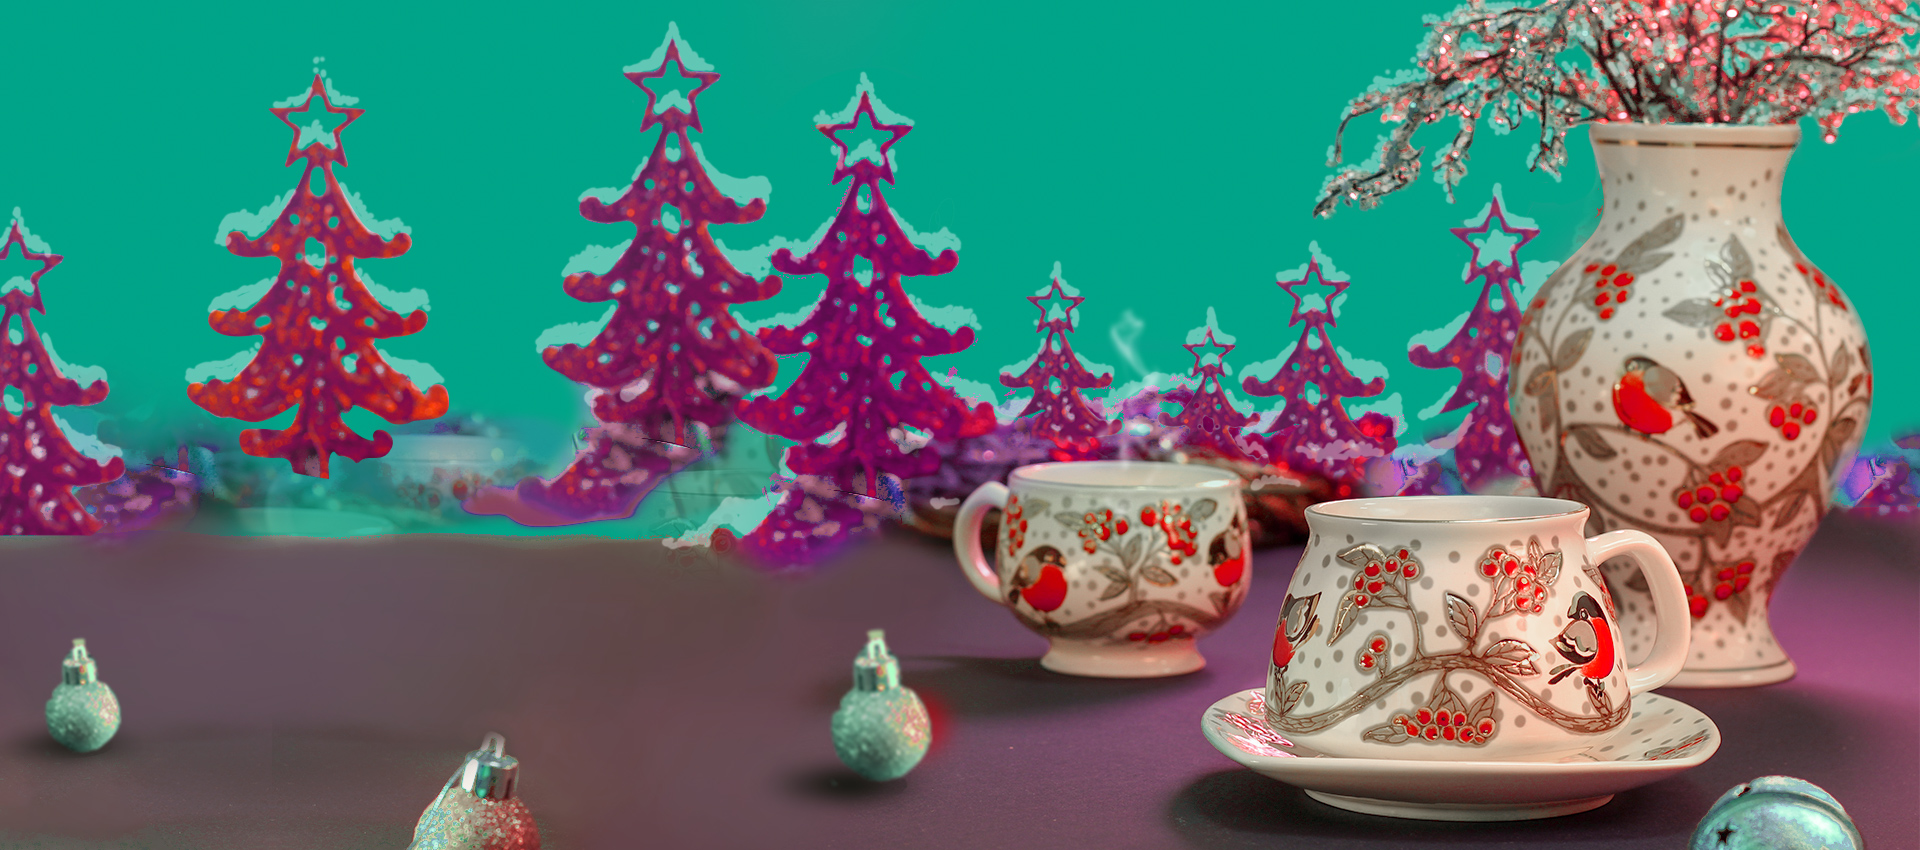 winter handmade ceramic tea set